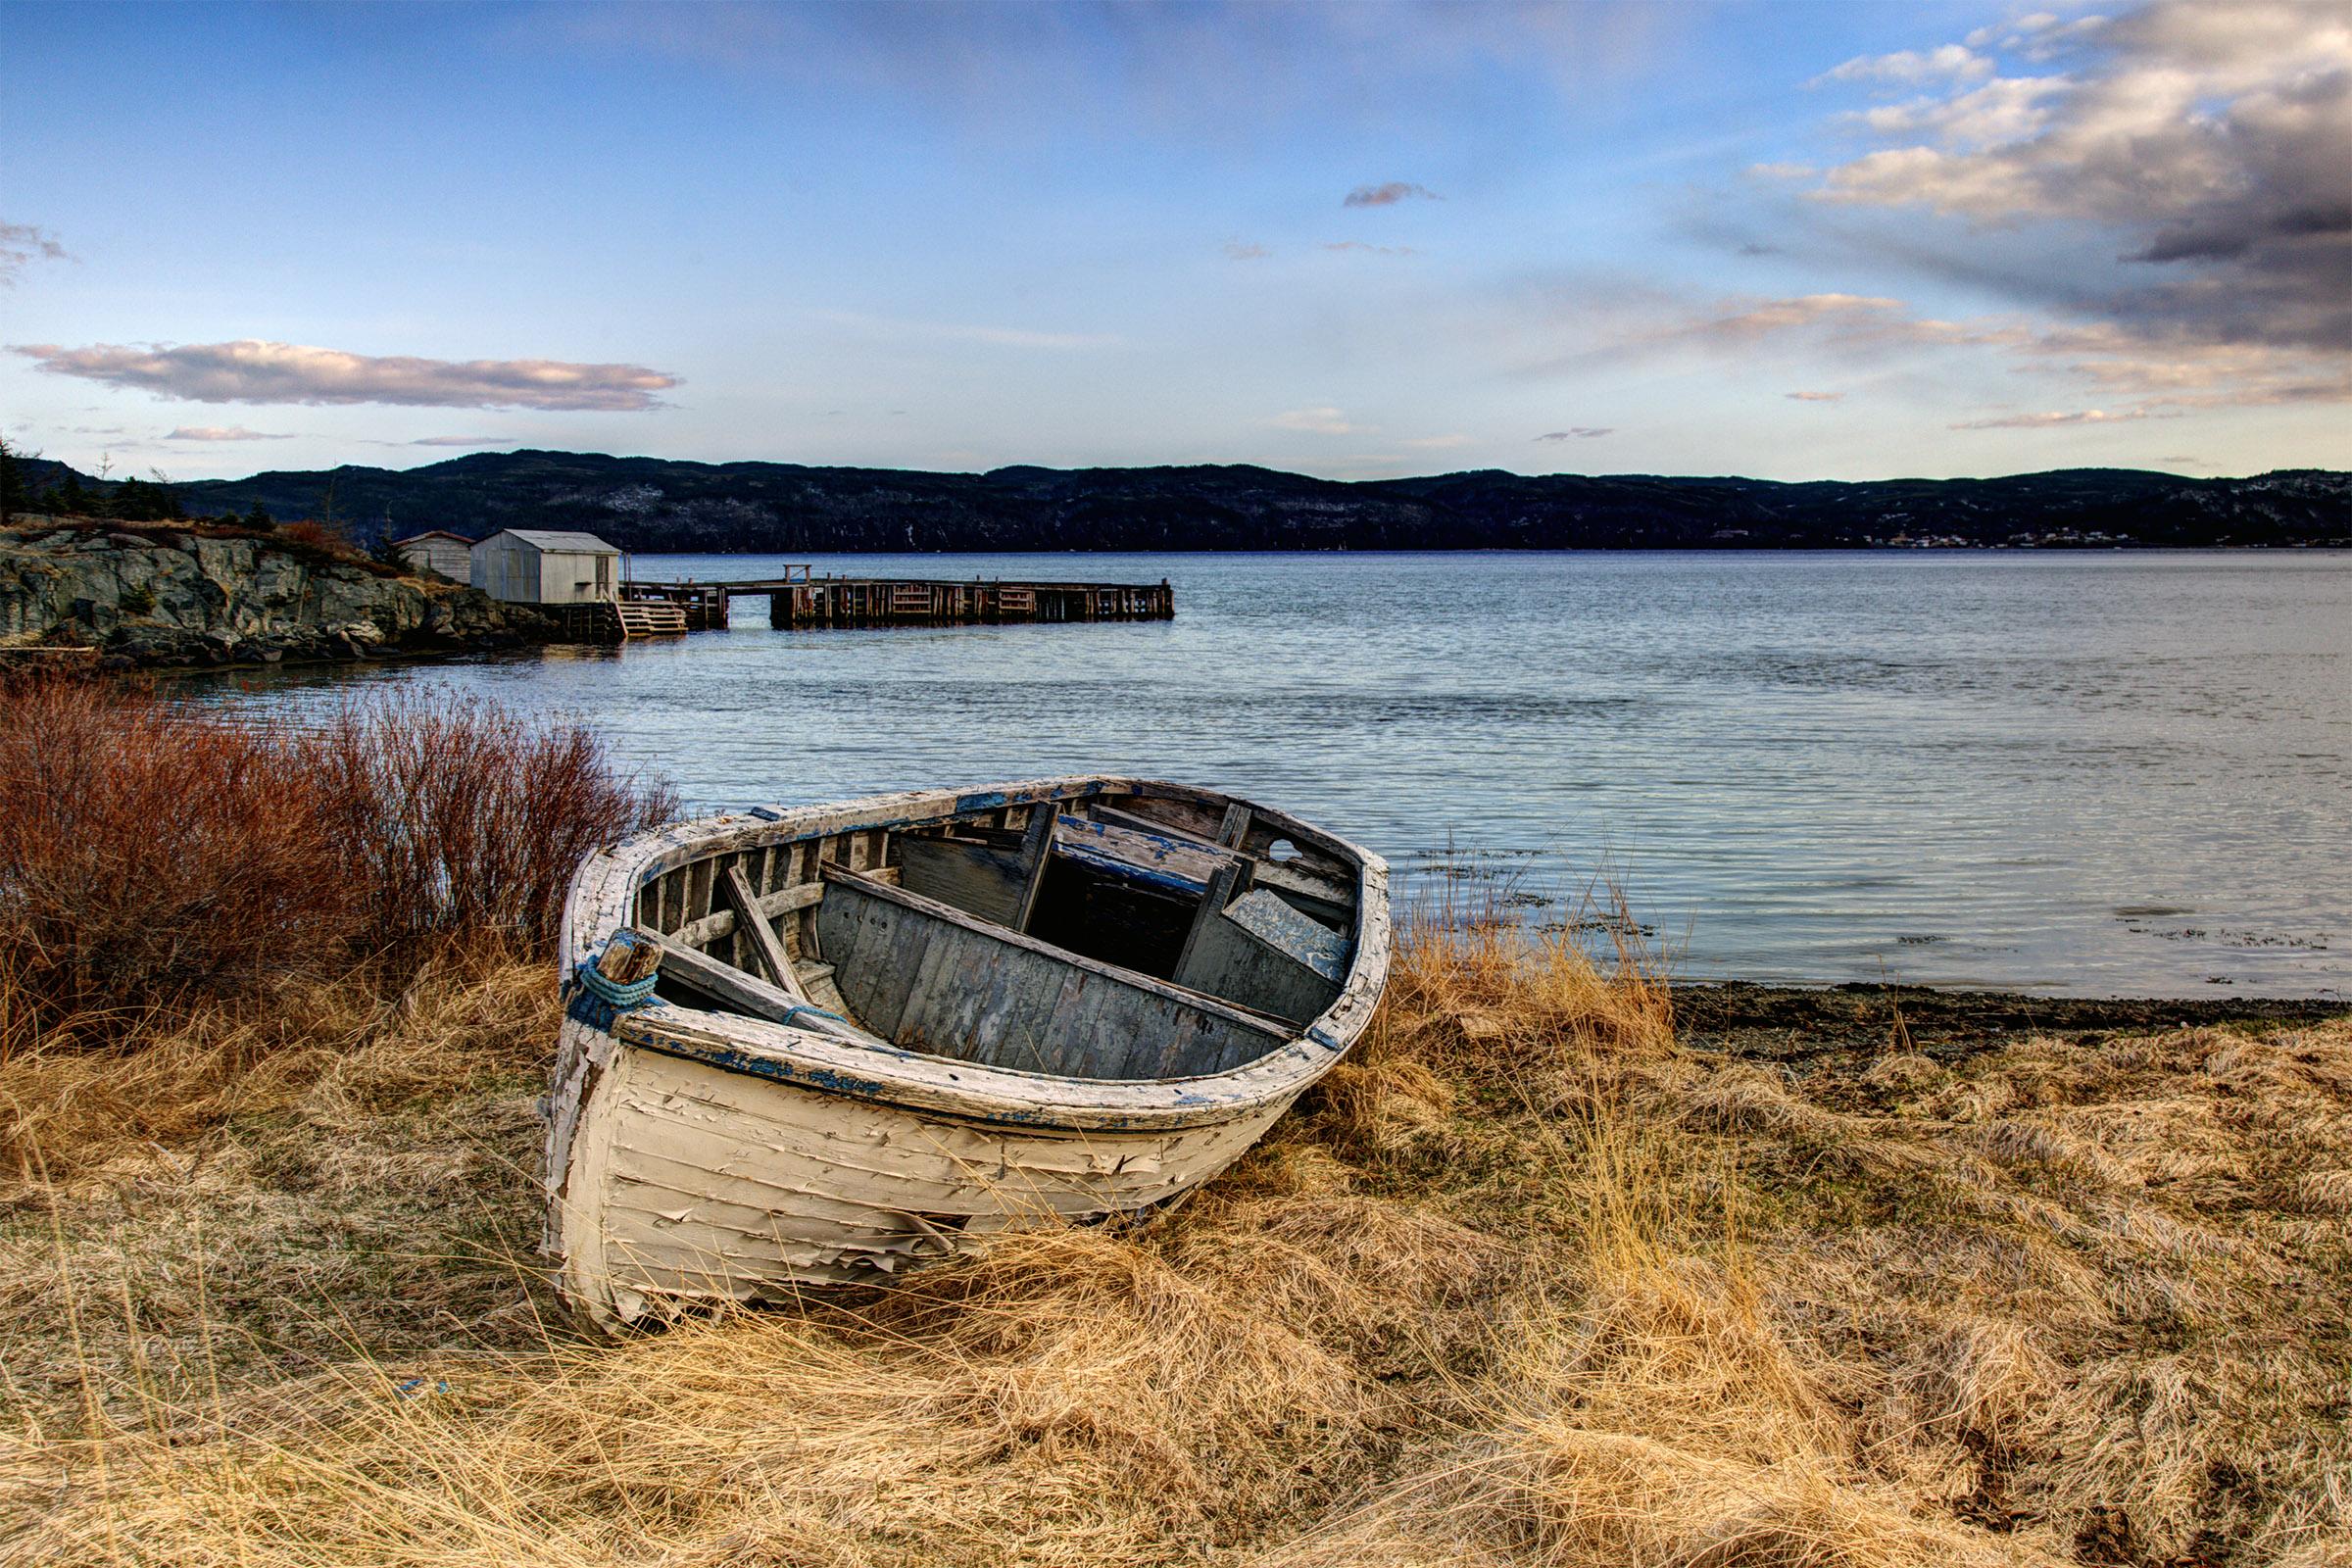 Boat, Travel, Sea, Seaside, Ship, HQ Photo